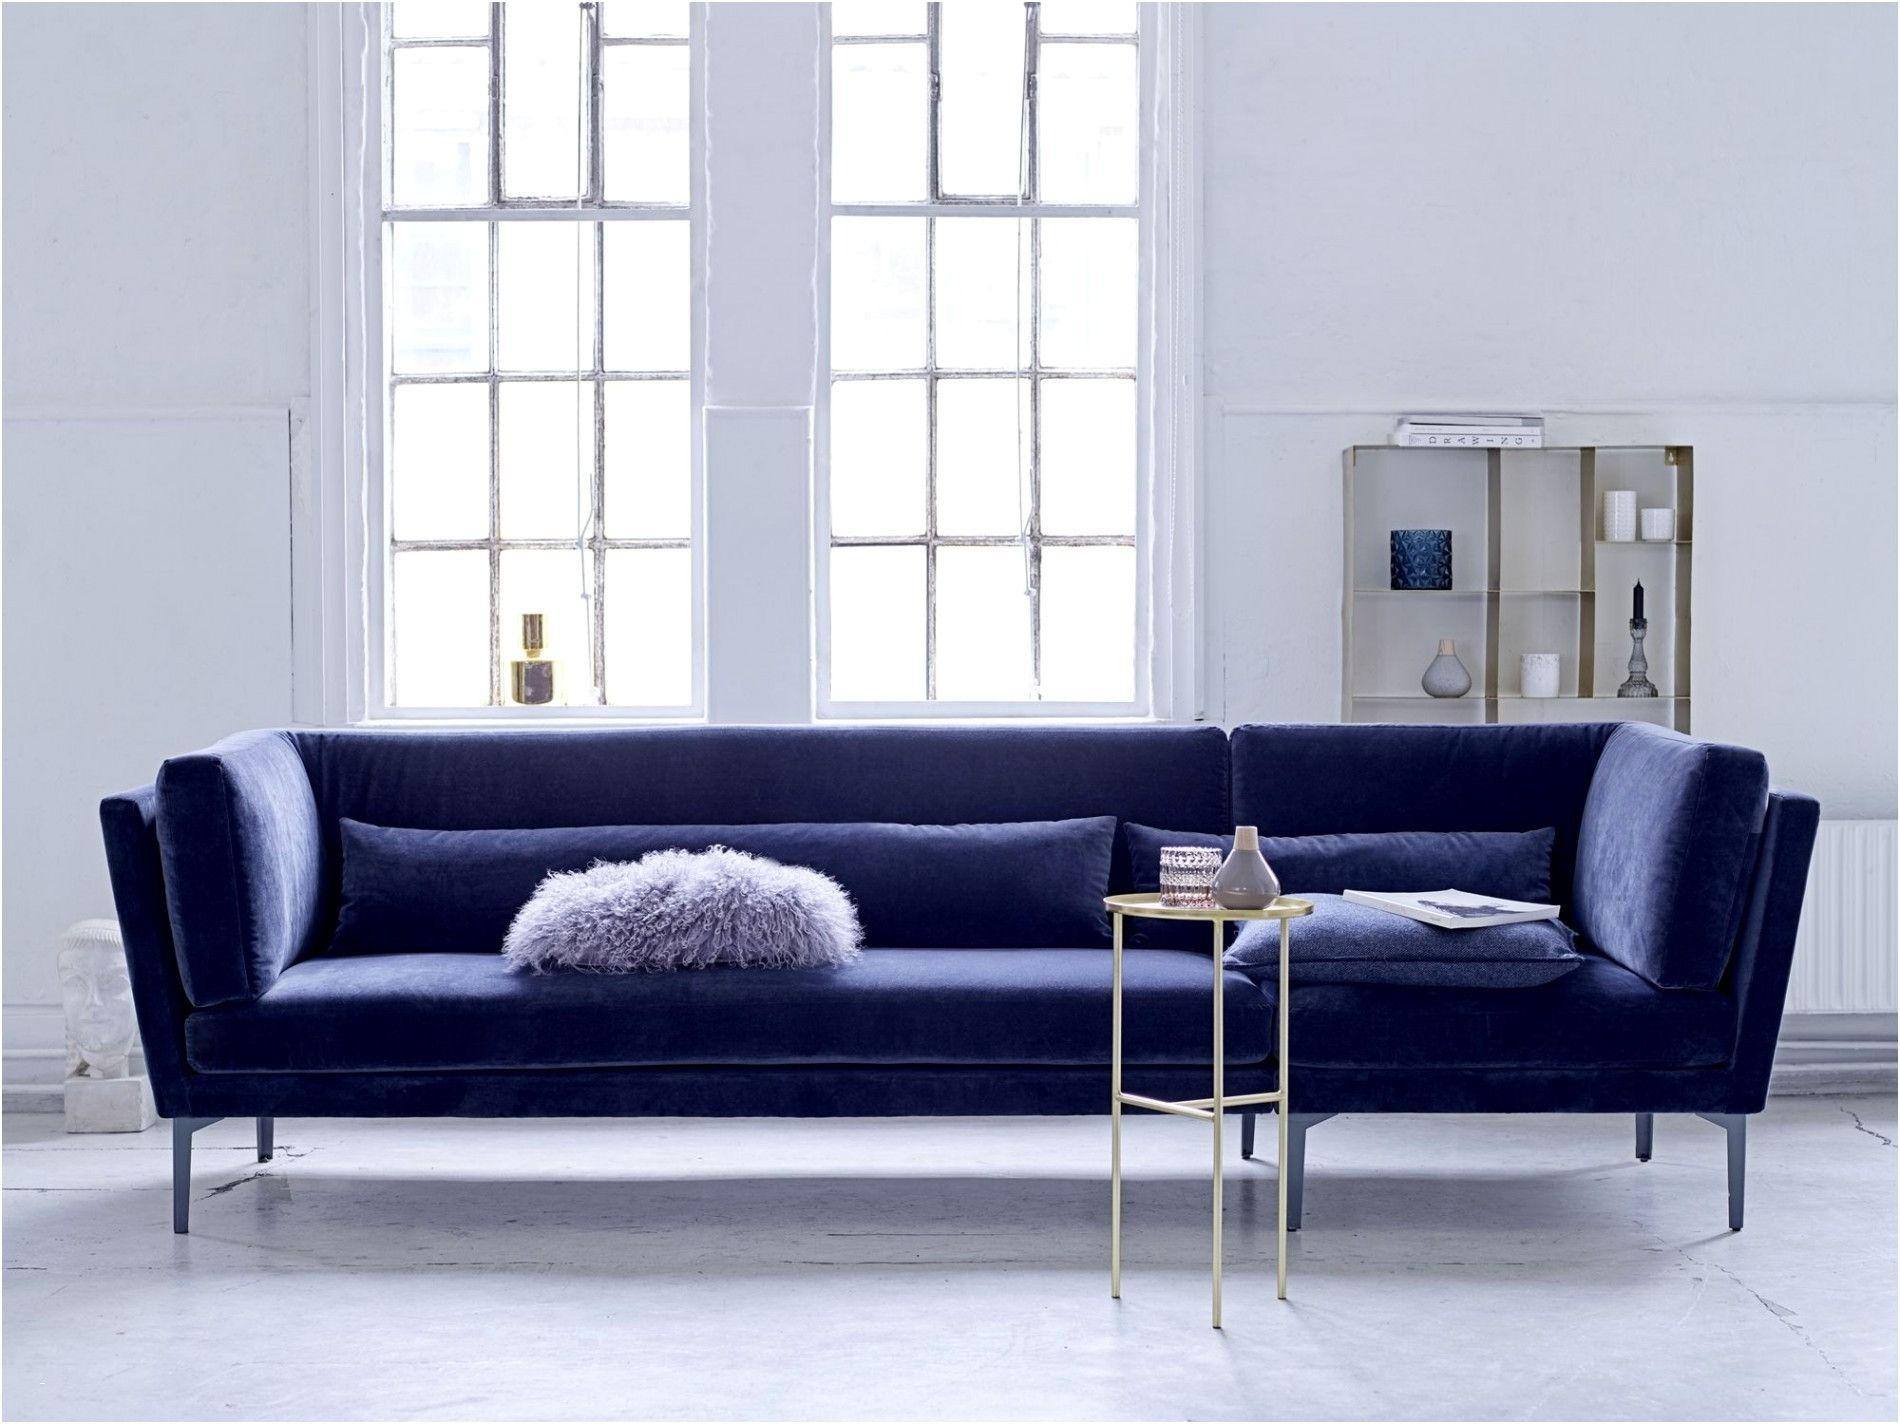 Brilliant Couch Blau Samt Living Room Sofa Design Blue Couch Living Room Blue Living Room Sets